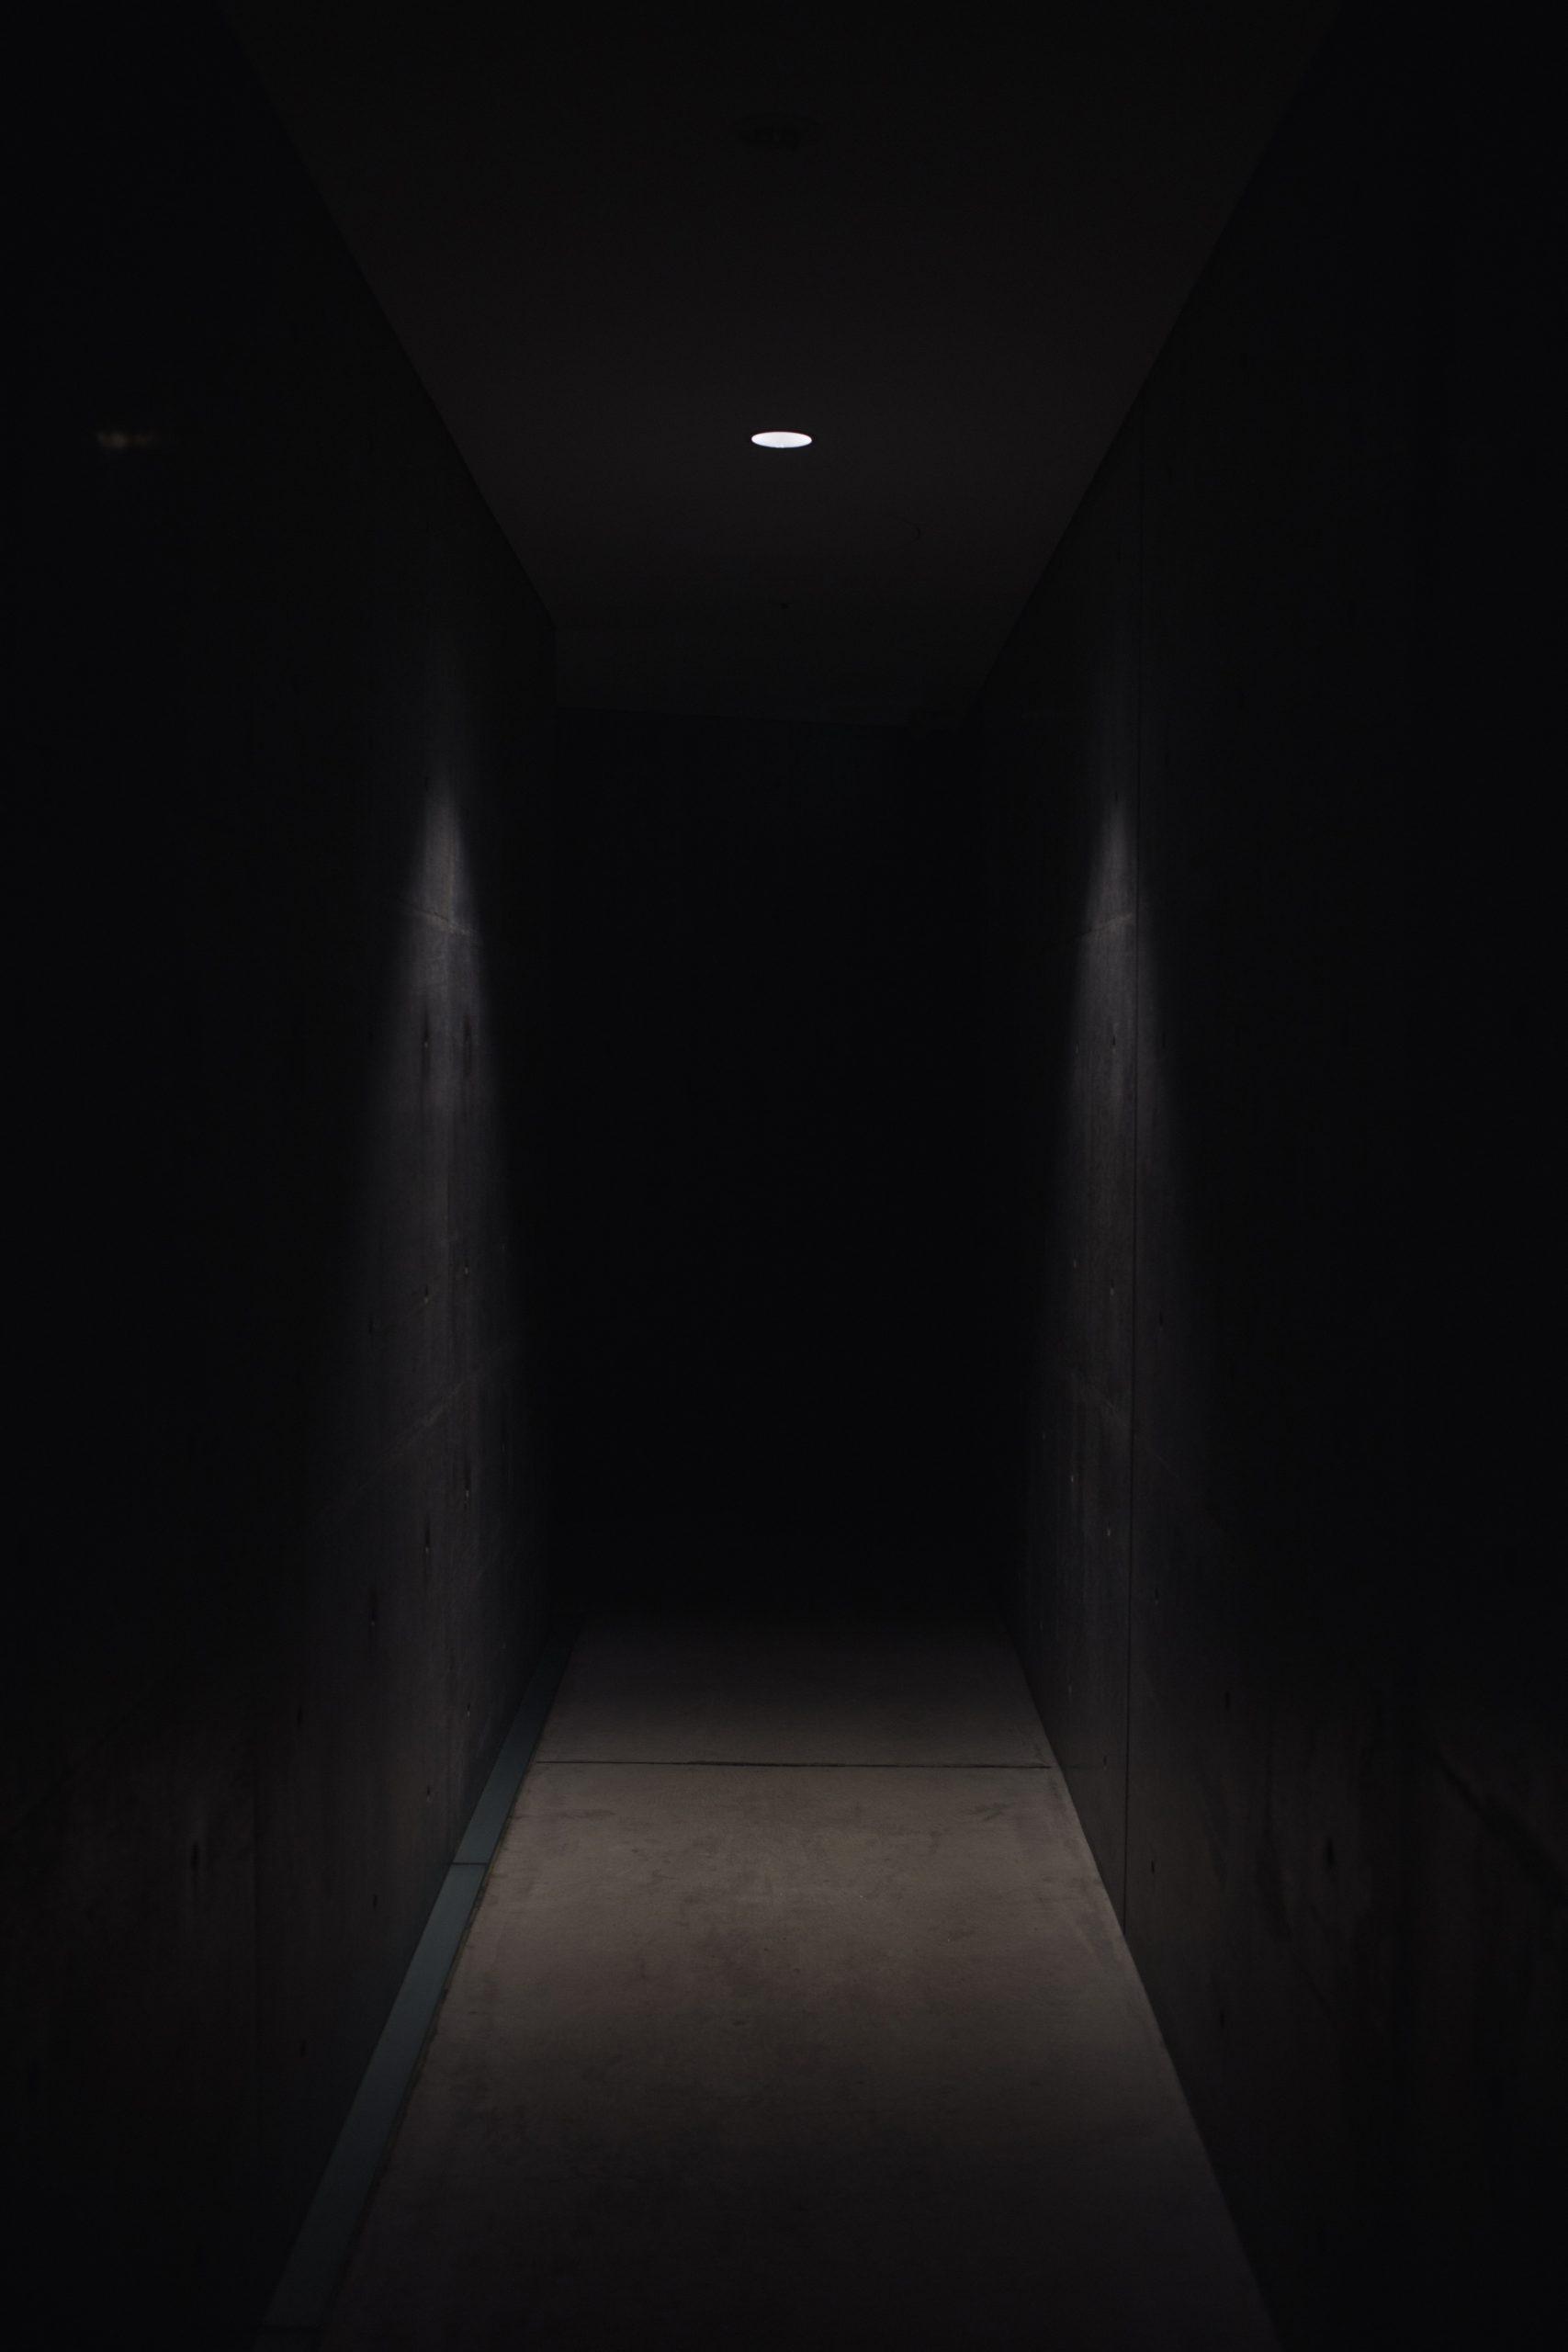 wallpaper Dark pathway lit with small light fixture